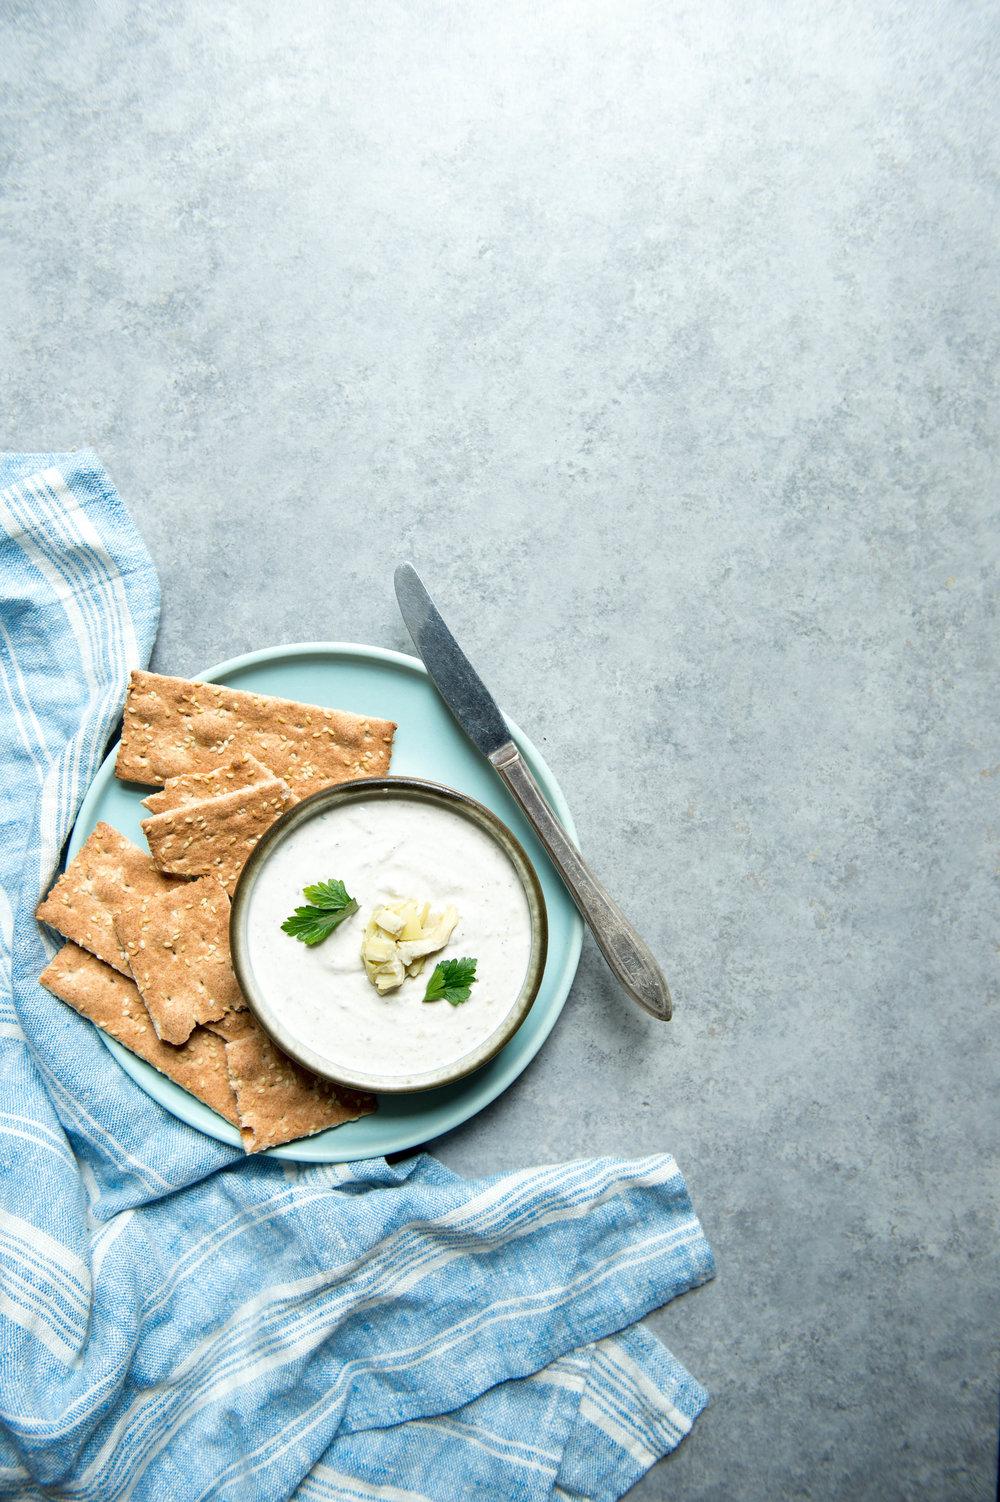 Sardine spread and crackers